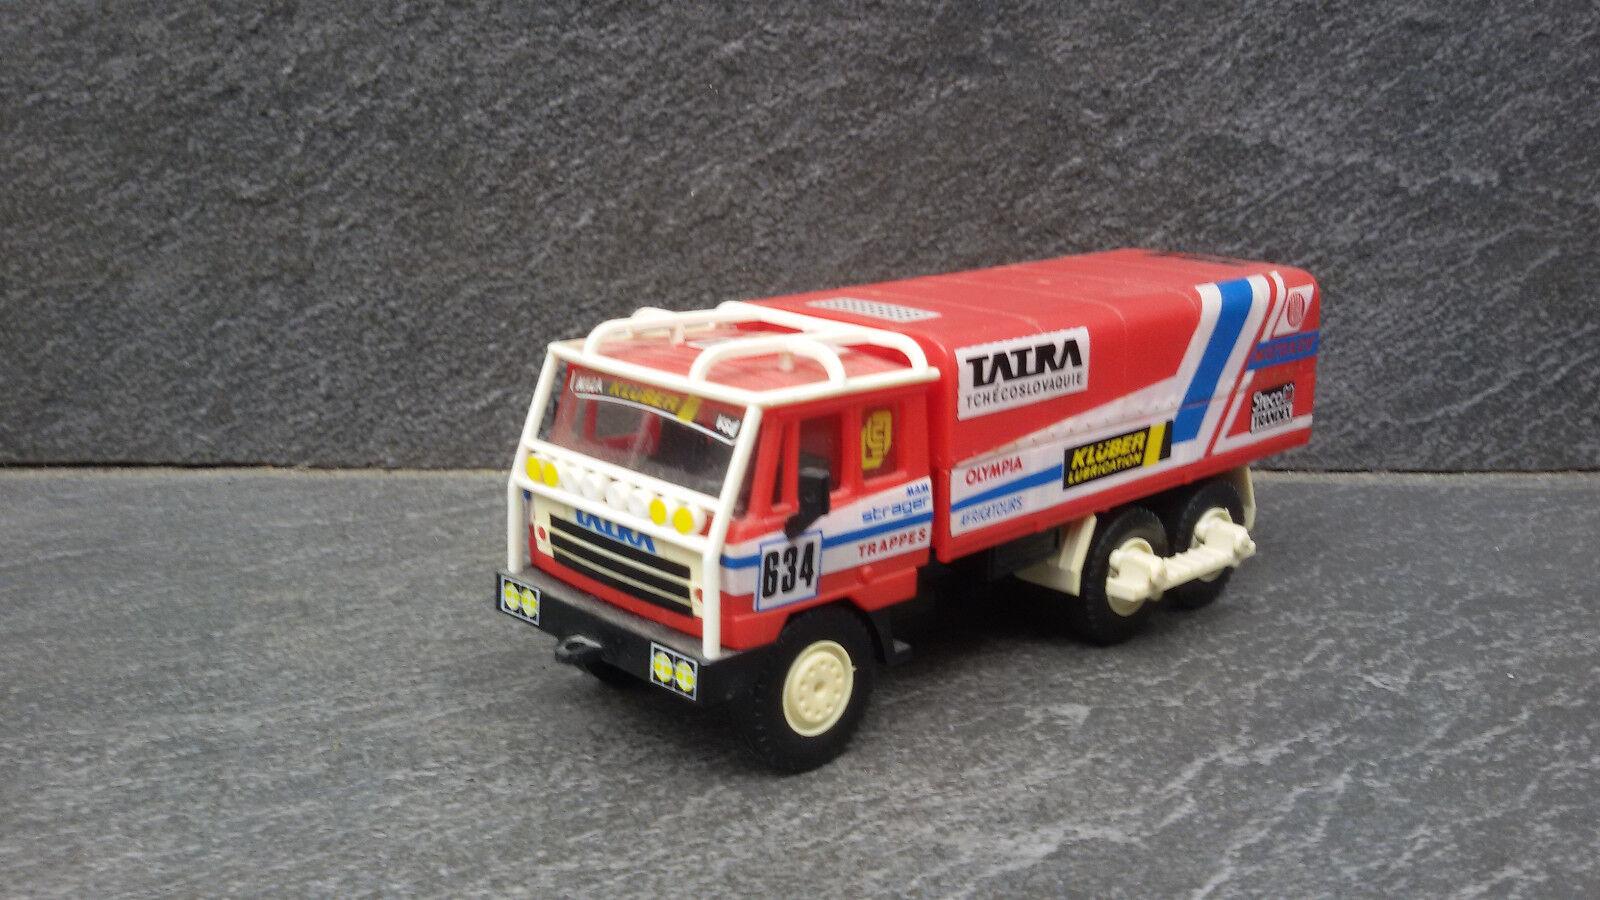 Très Rare Limited Edition TOY TATRA 815 camion vainqueur Rallye Dakar 1988